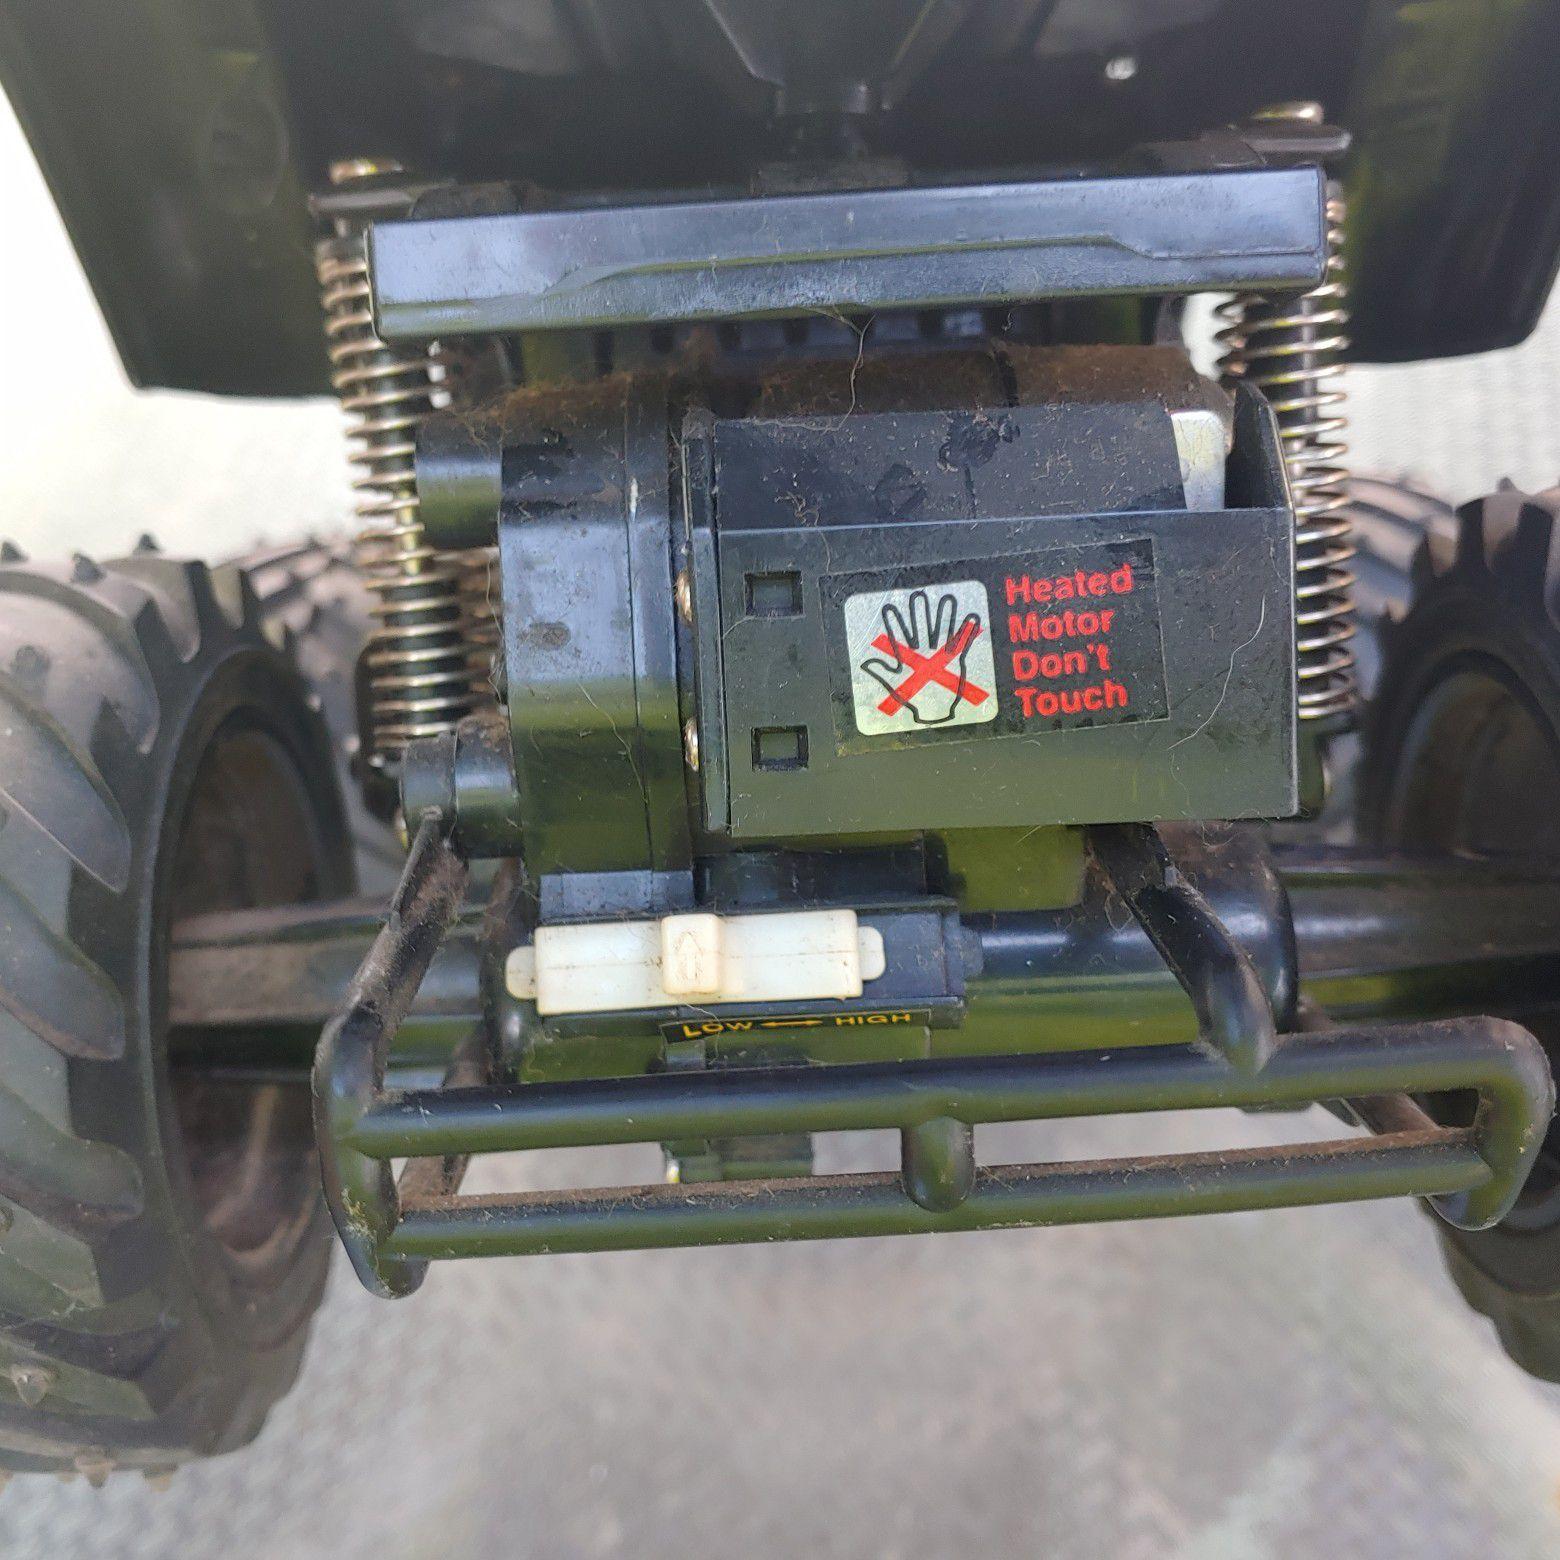 Vintage Radio Shack Intruder RC truck 4x4.